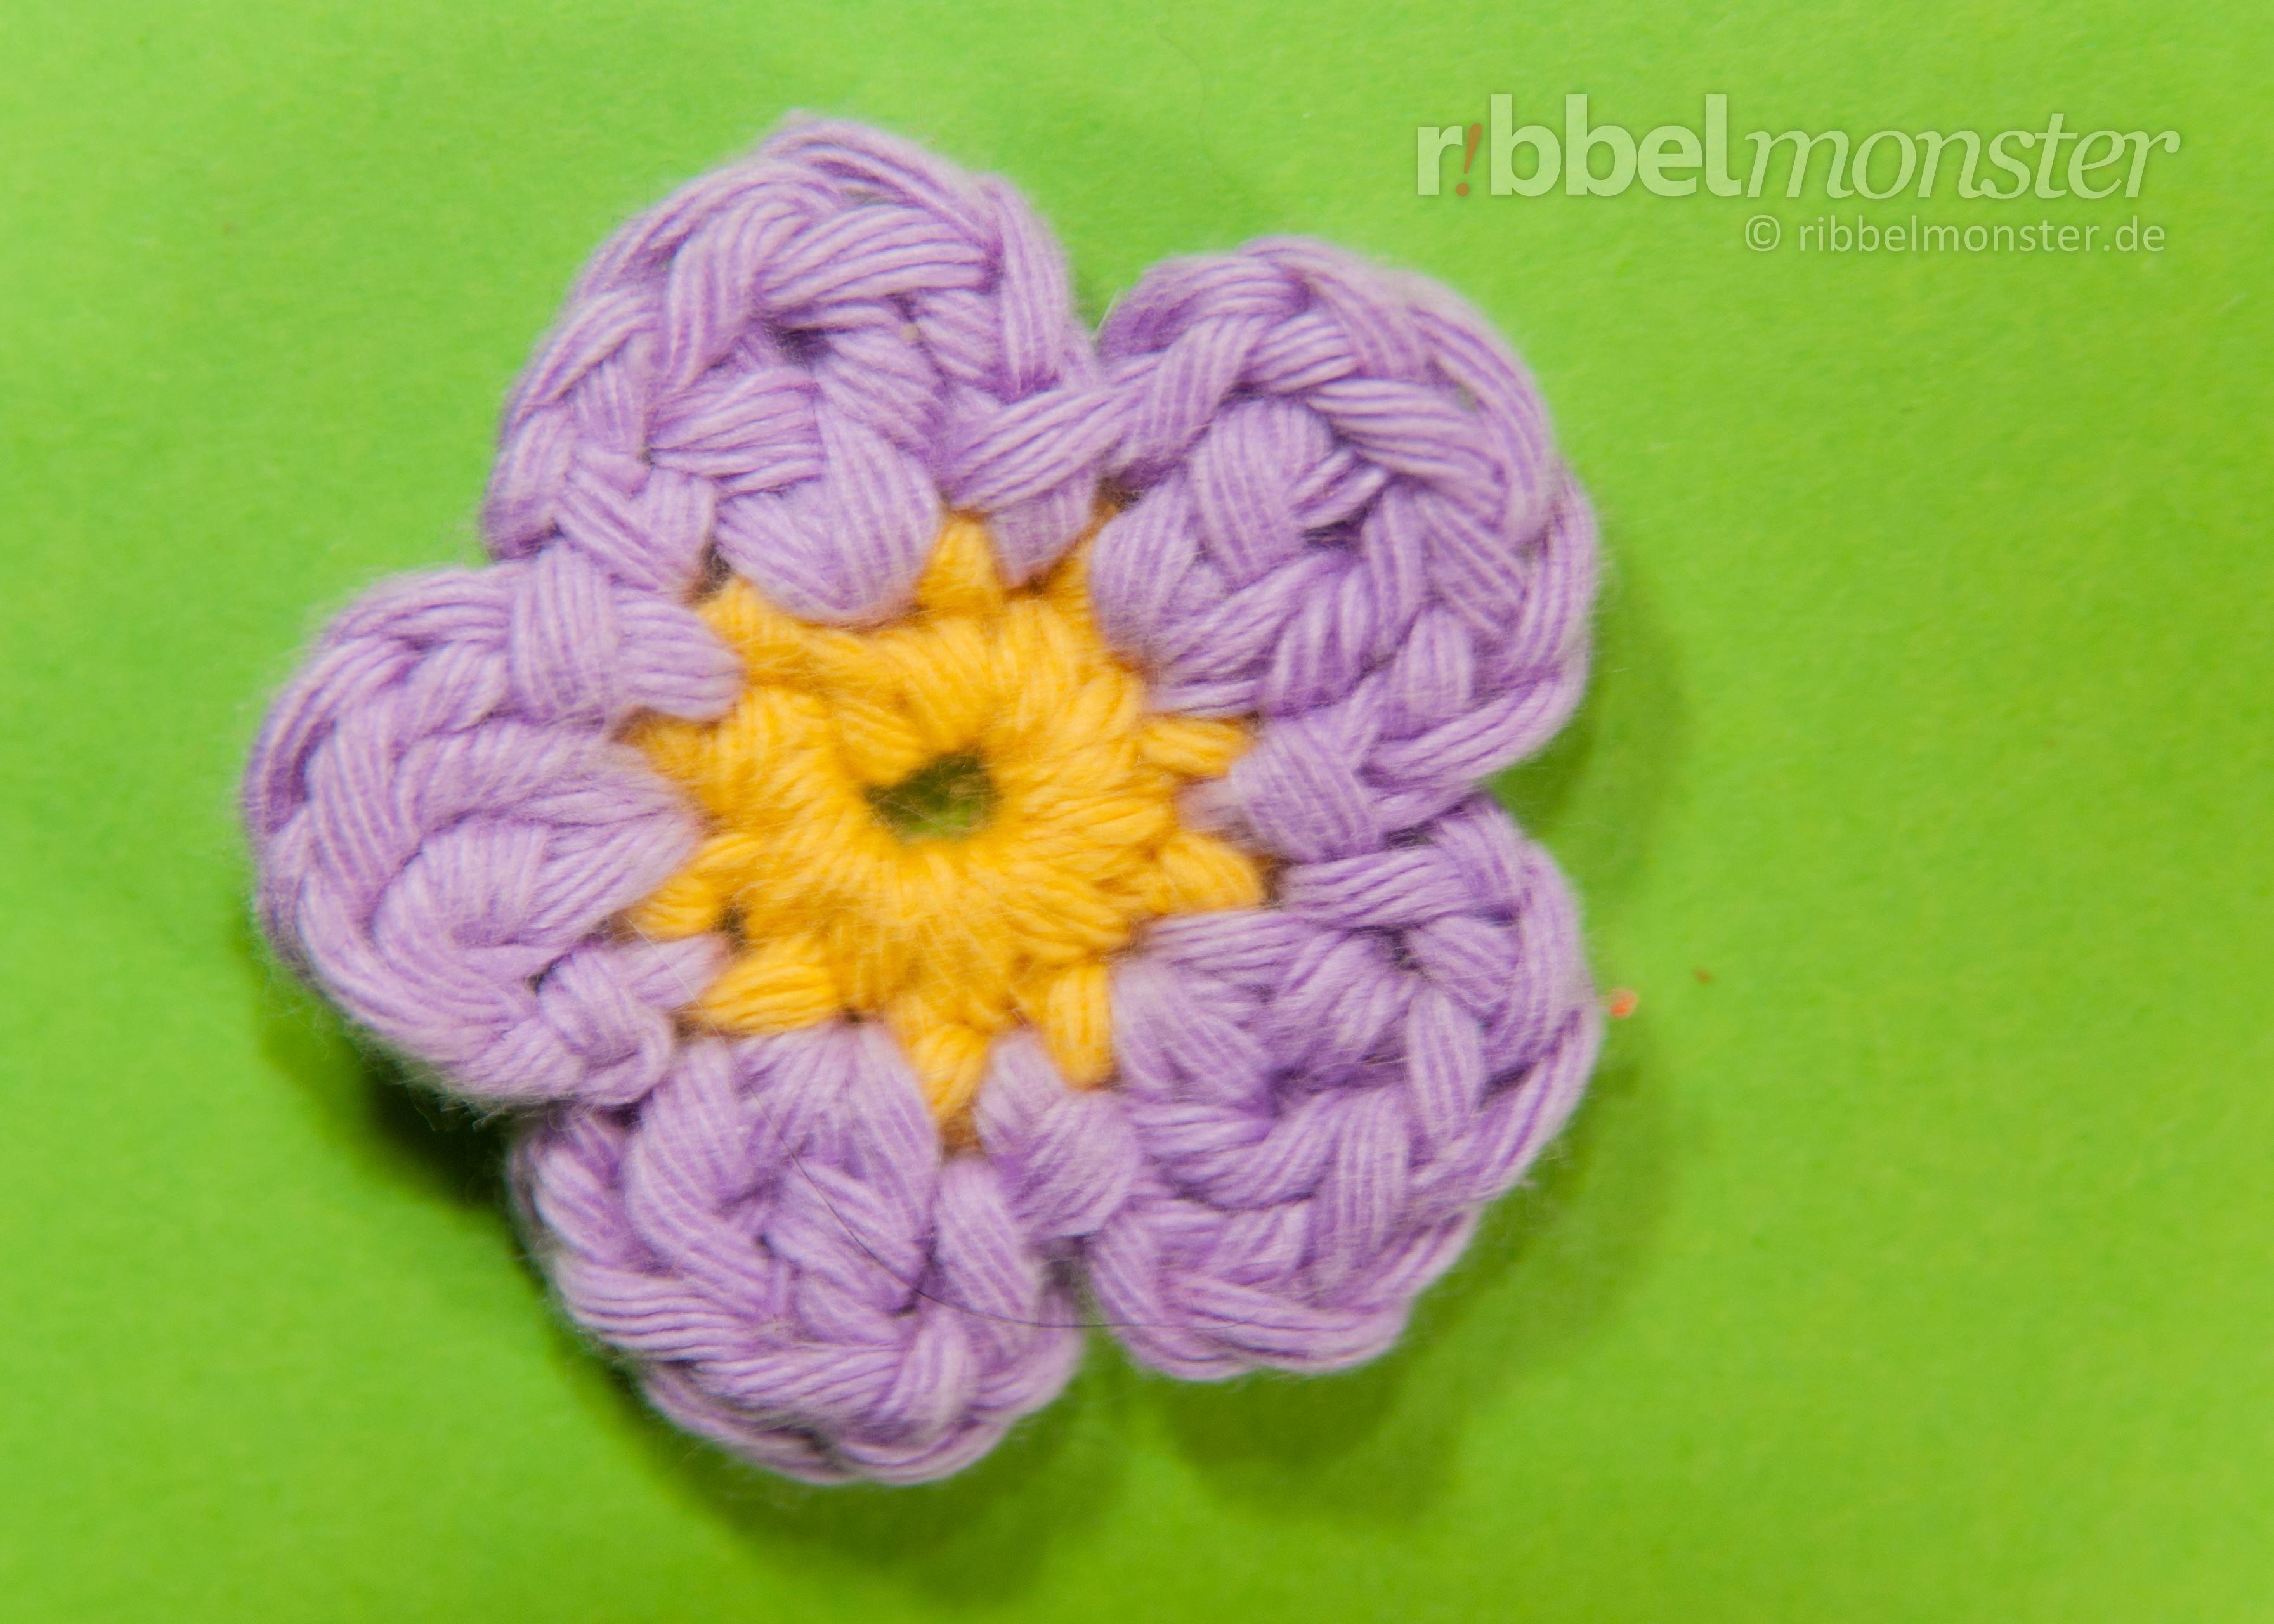 Blüte Häkeln Anleitung Häkelanleitung Crochet Häkeln